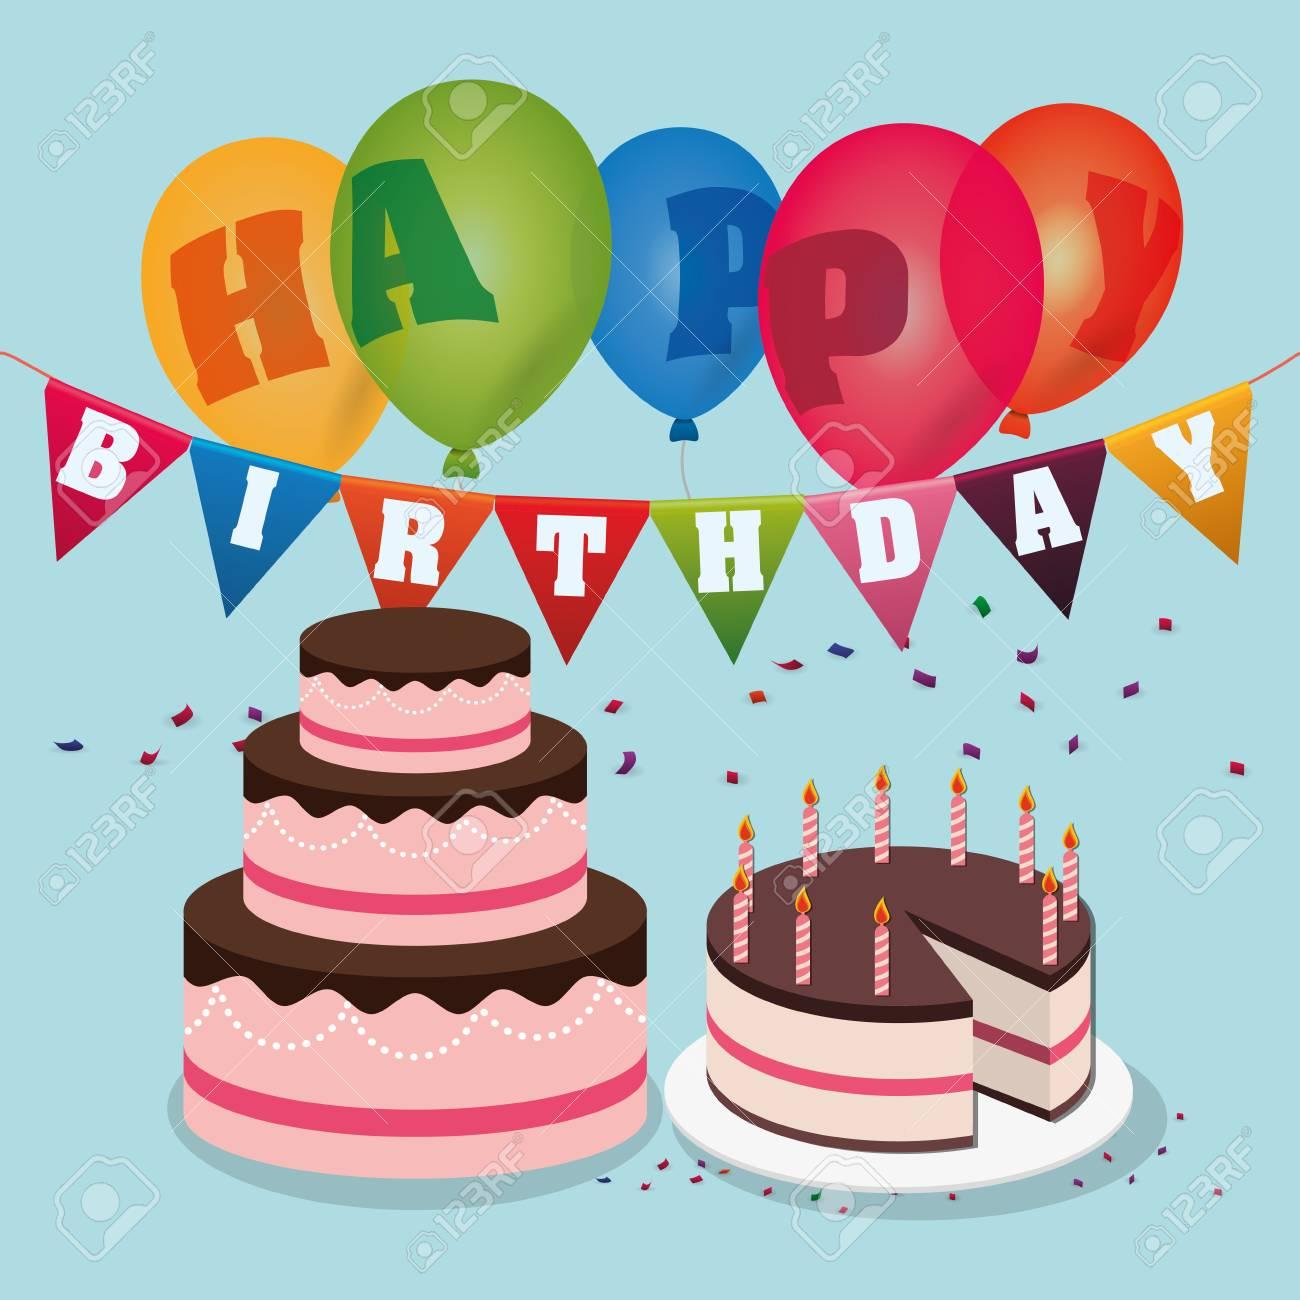 Happy Birthday Cakes Balloons Garland Confetti Stock Vector